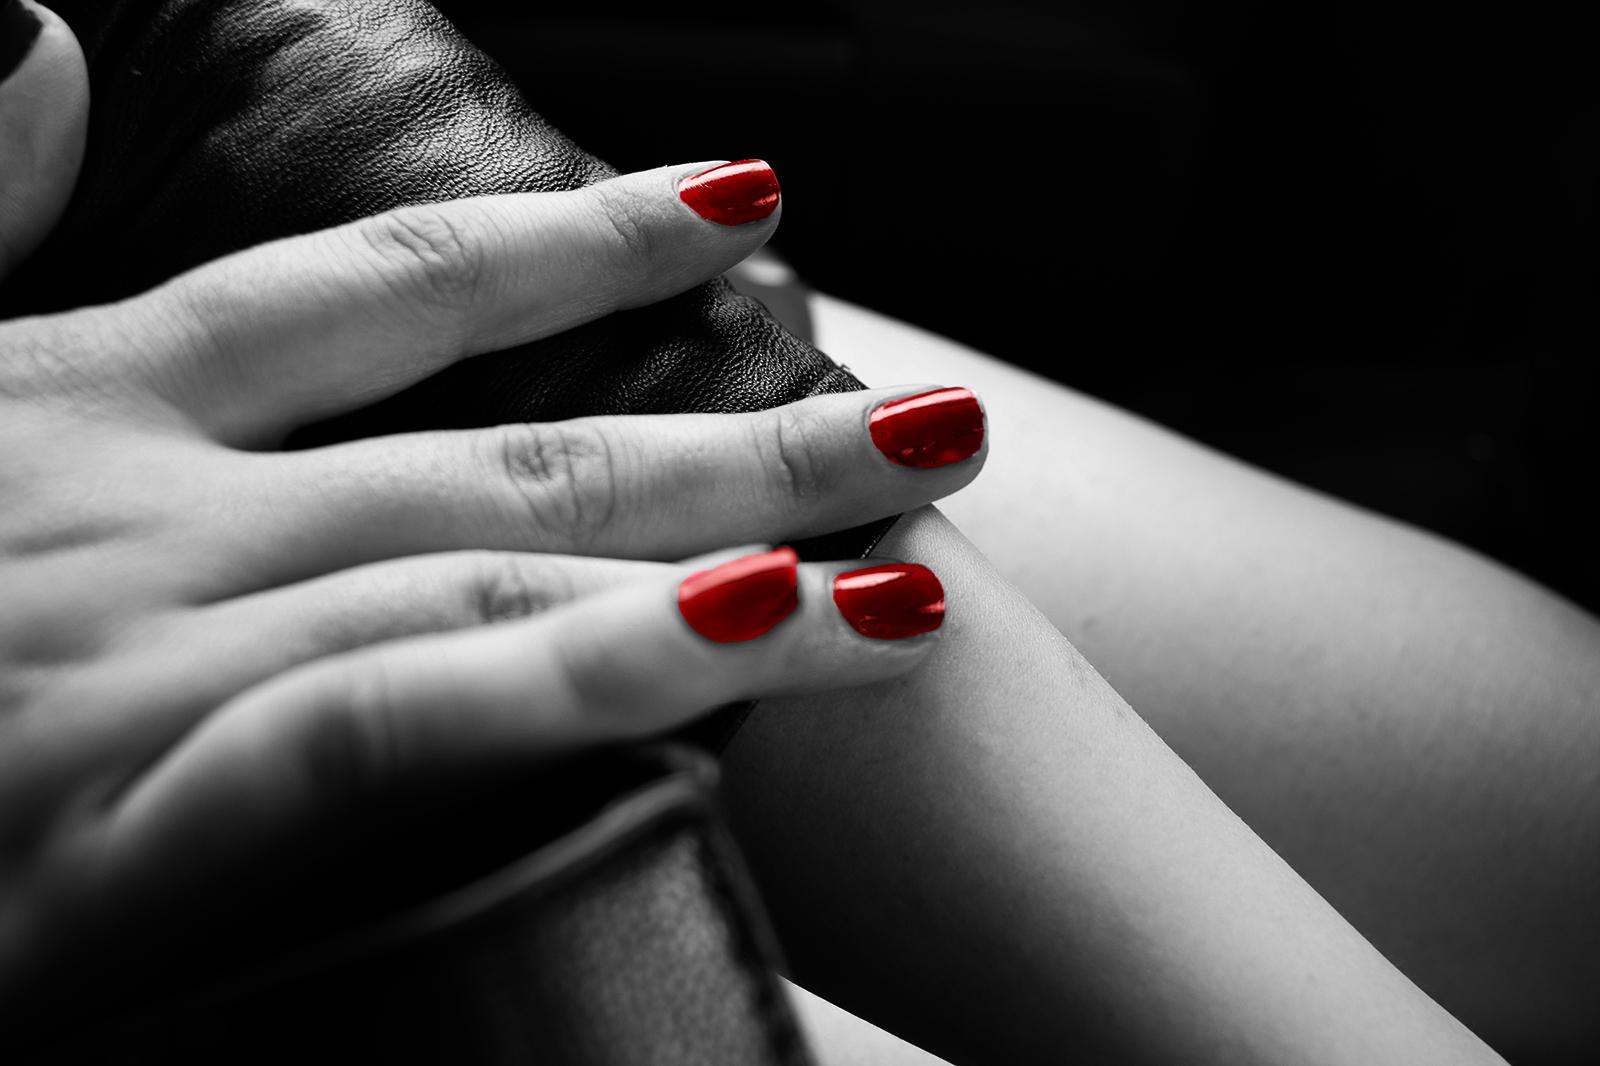 Wallpaper : red, nails, joint, blackandwhite, bw, woman, finger, lip ...